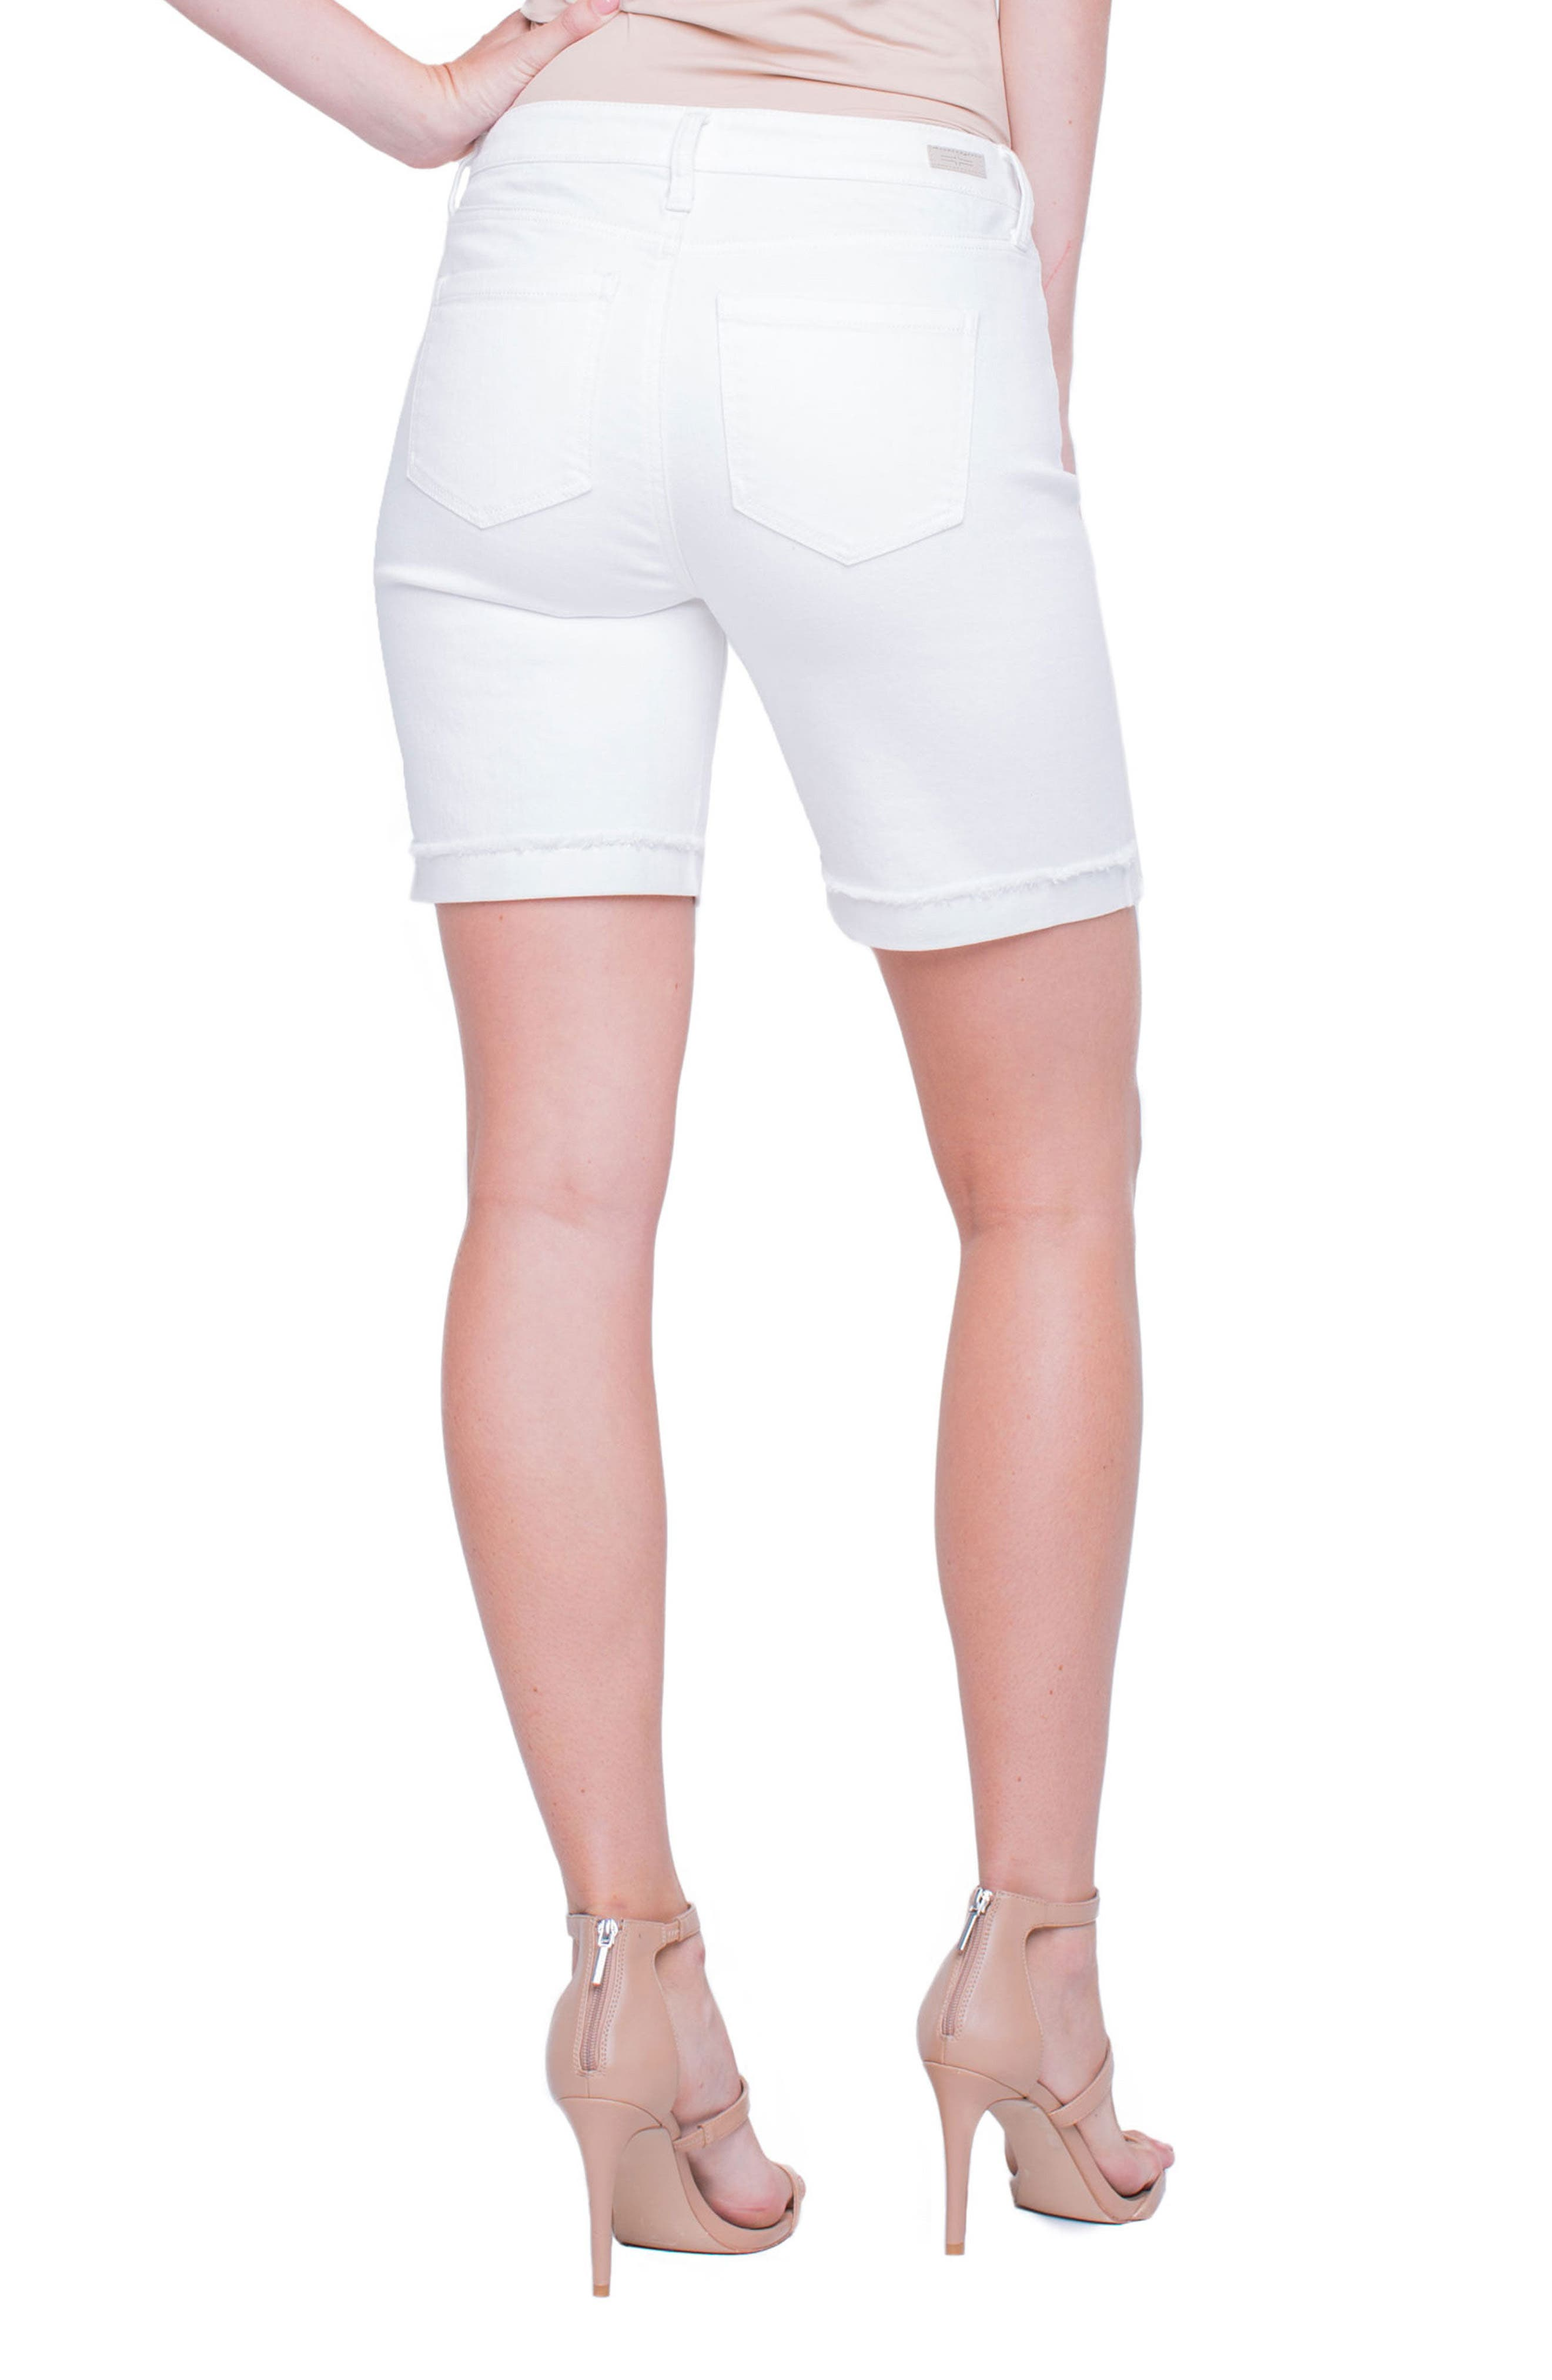 Casey White Denim Shorts,                             Alternate thumbnail 2, color,